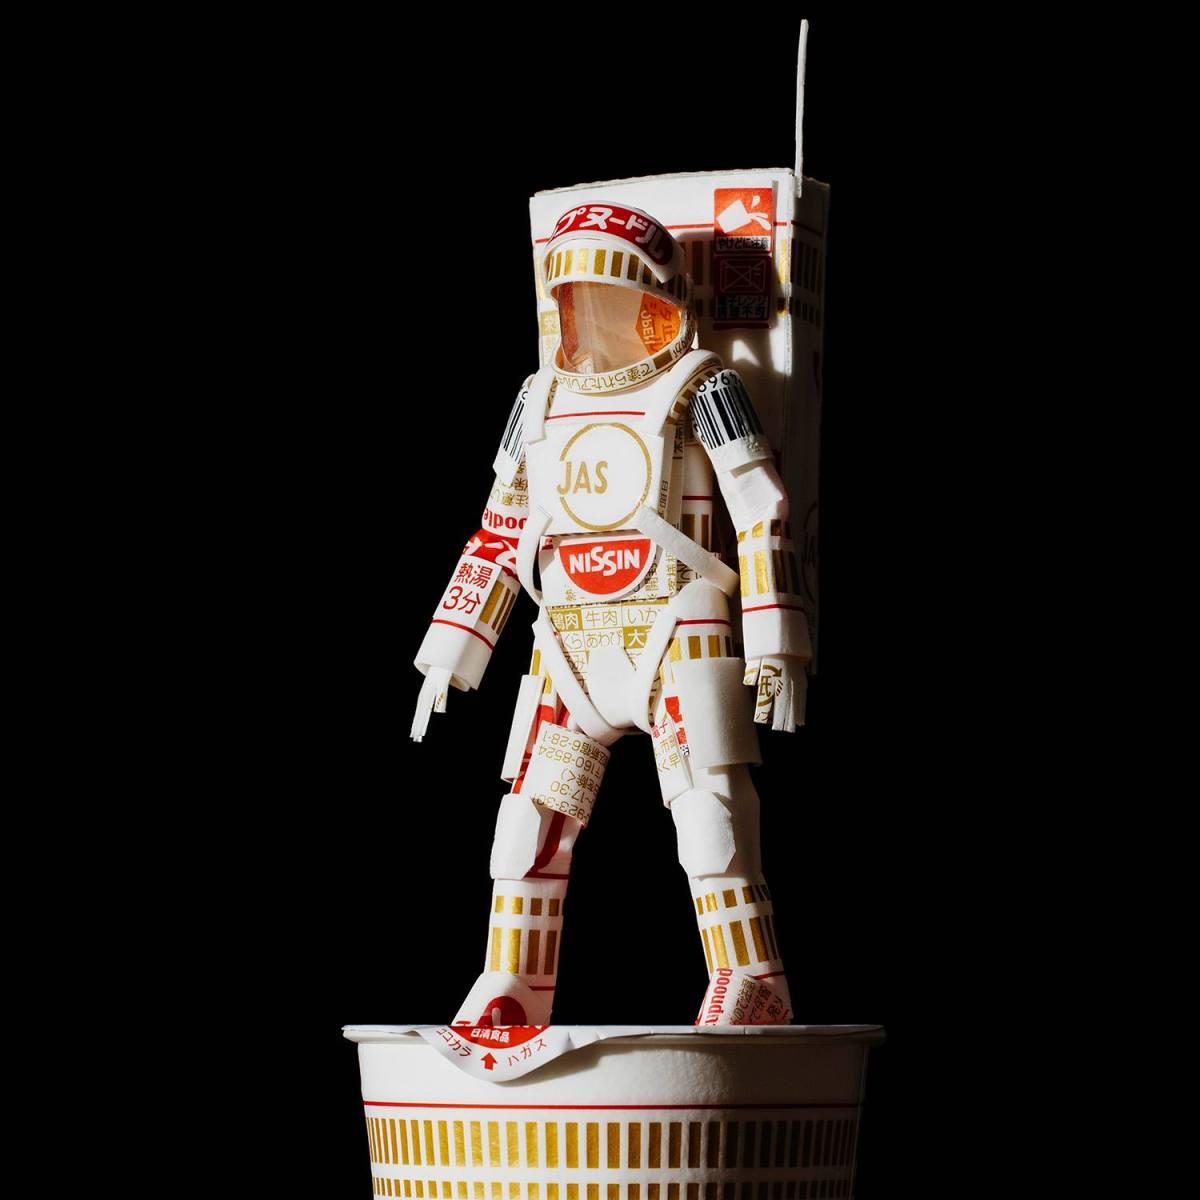 Haruki Japanese Paper Sculptor Awesomebyte Image 14